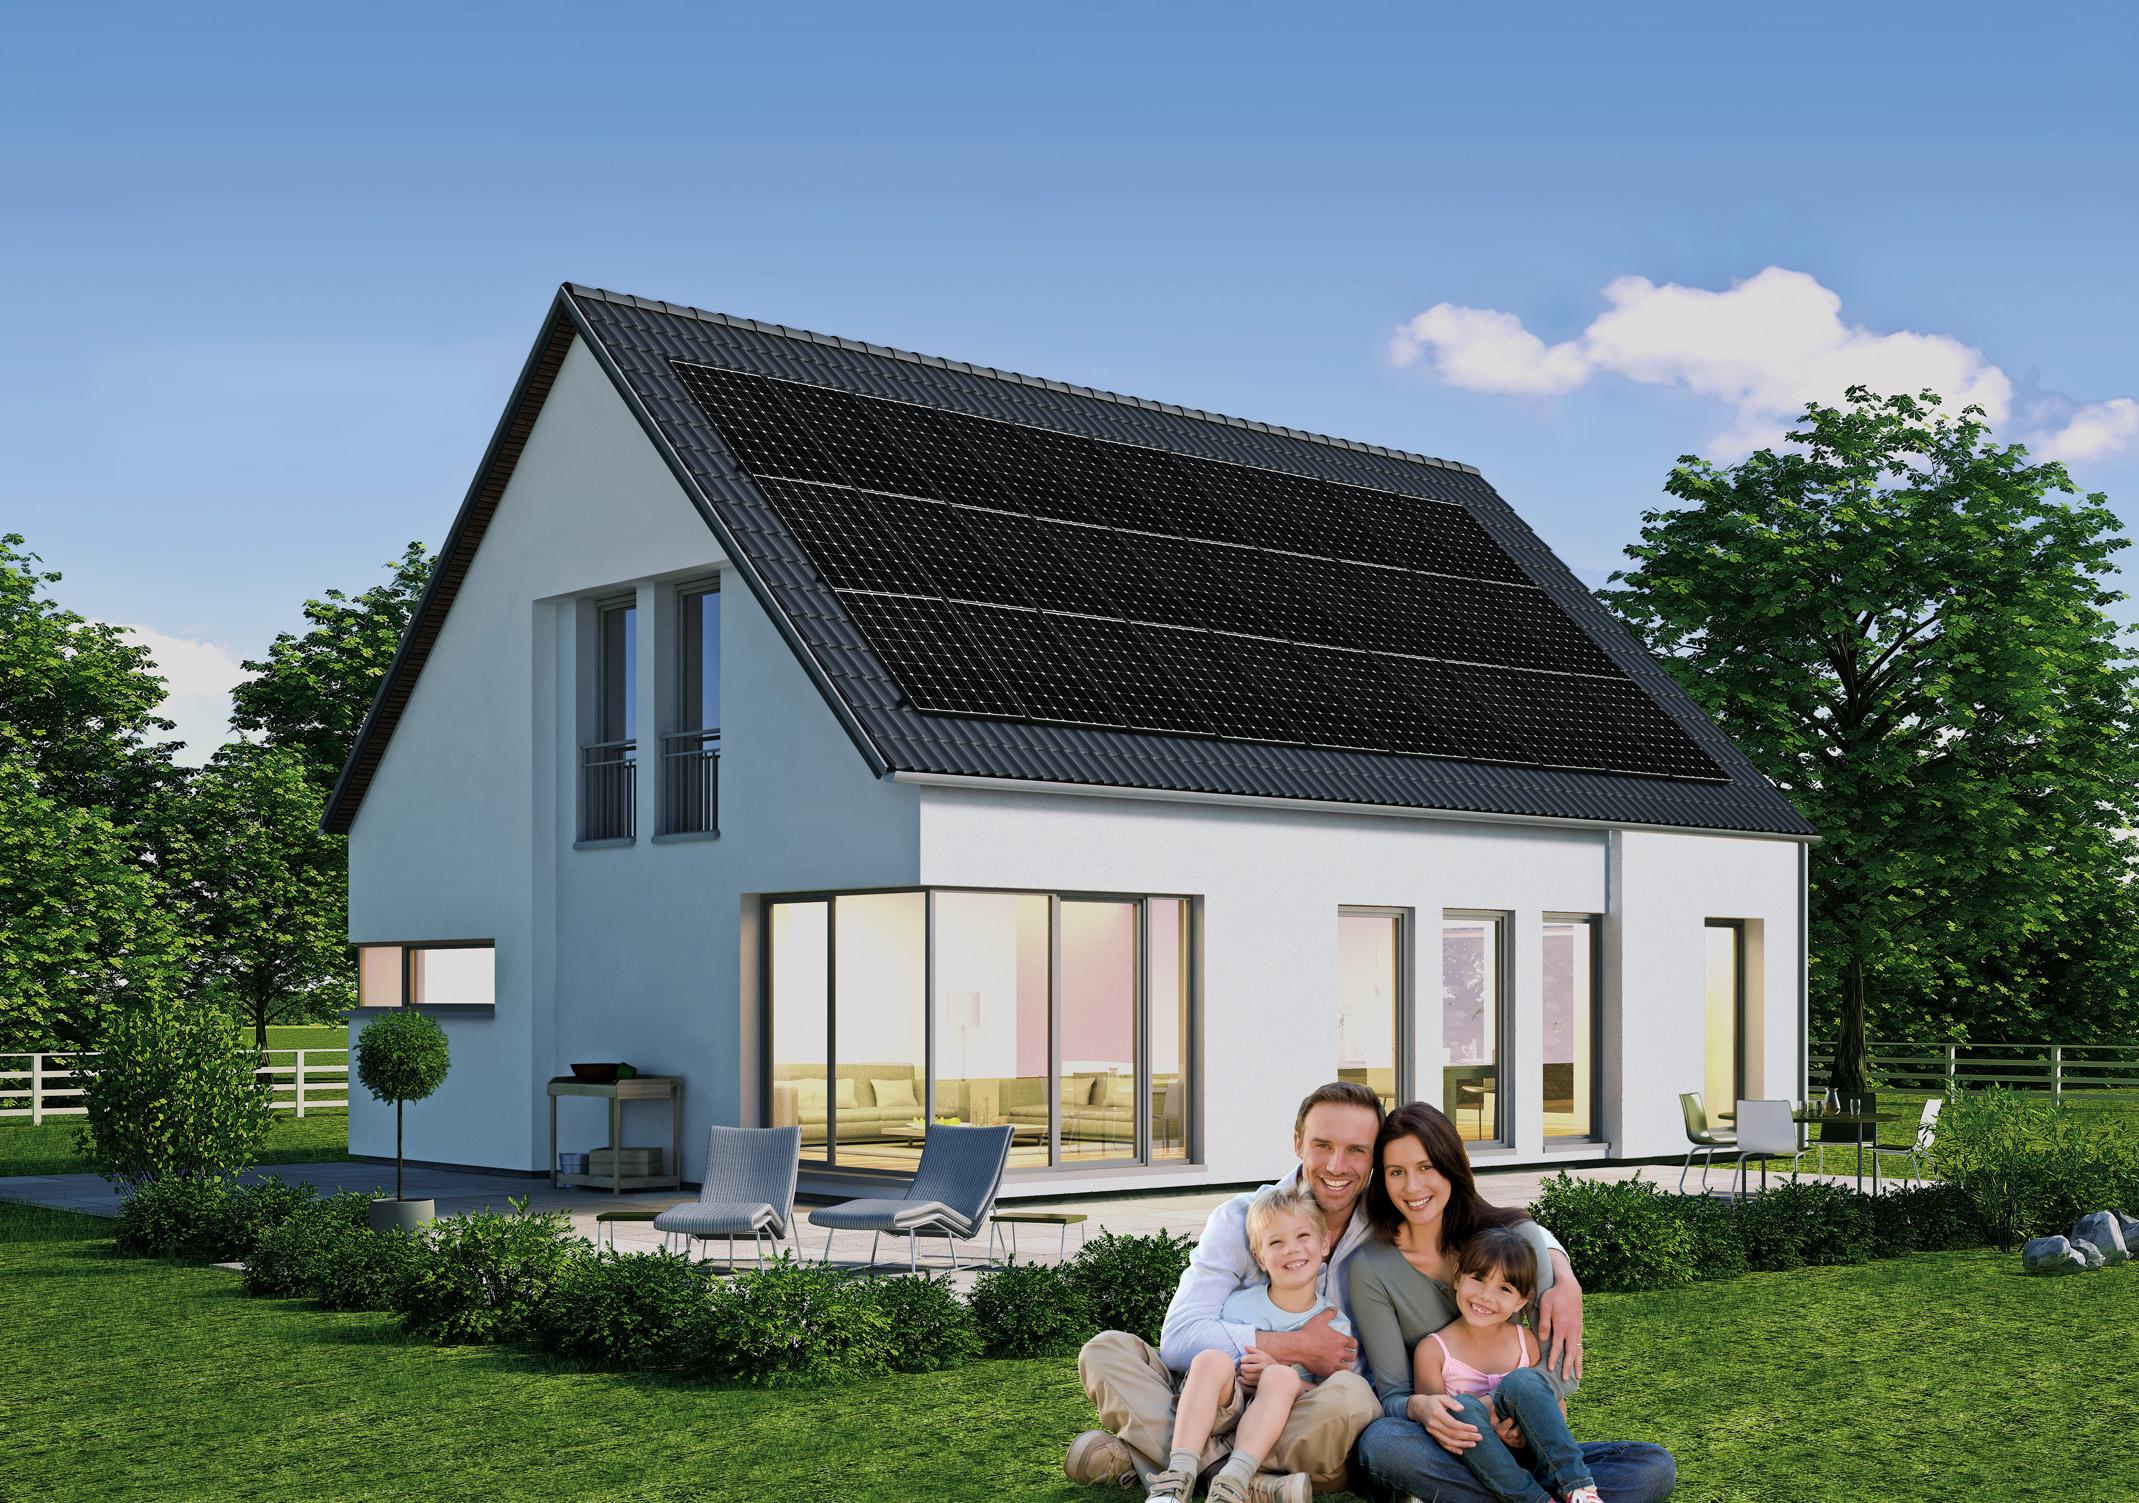 solarstrom hei t heute energiekosten senken. Black Bedroom Furniture Sets. Home Design Ideas